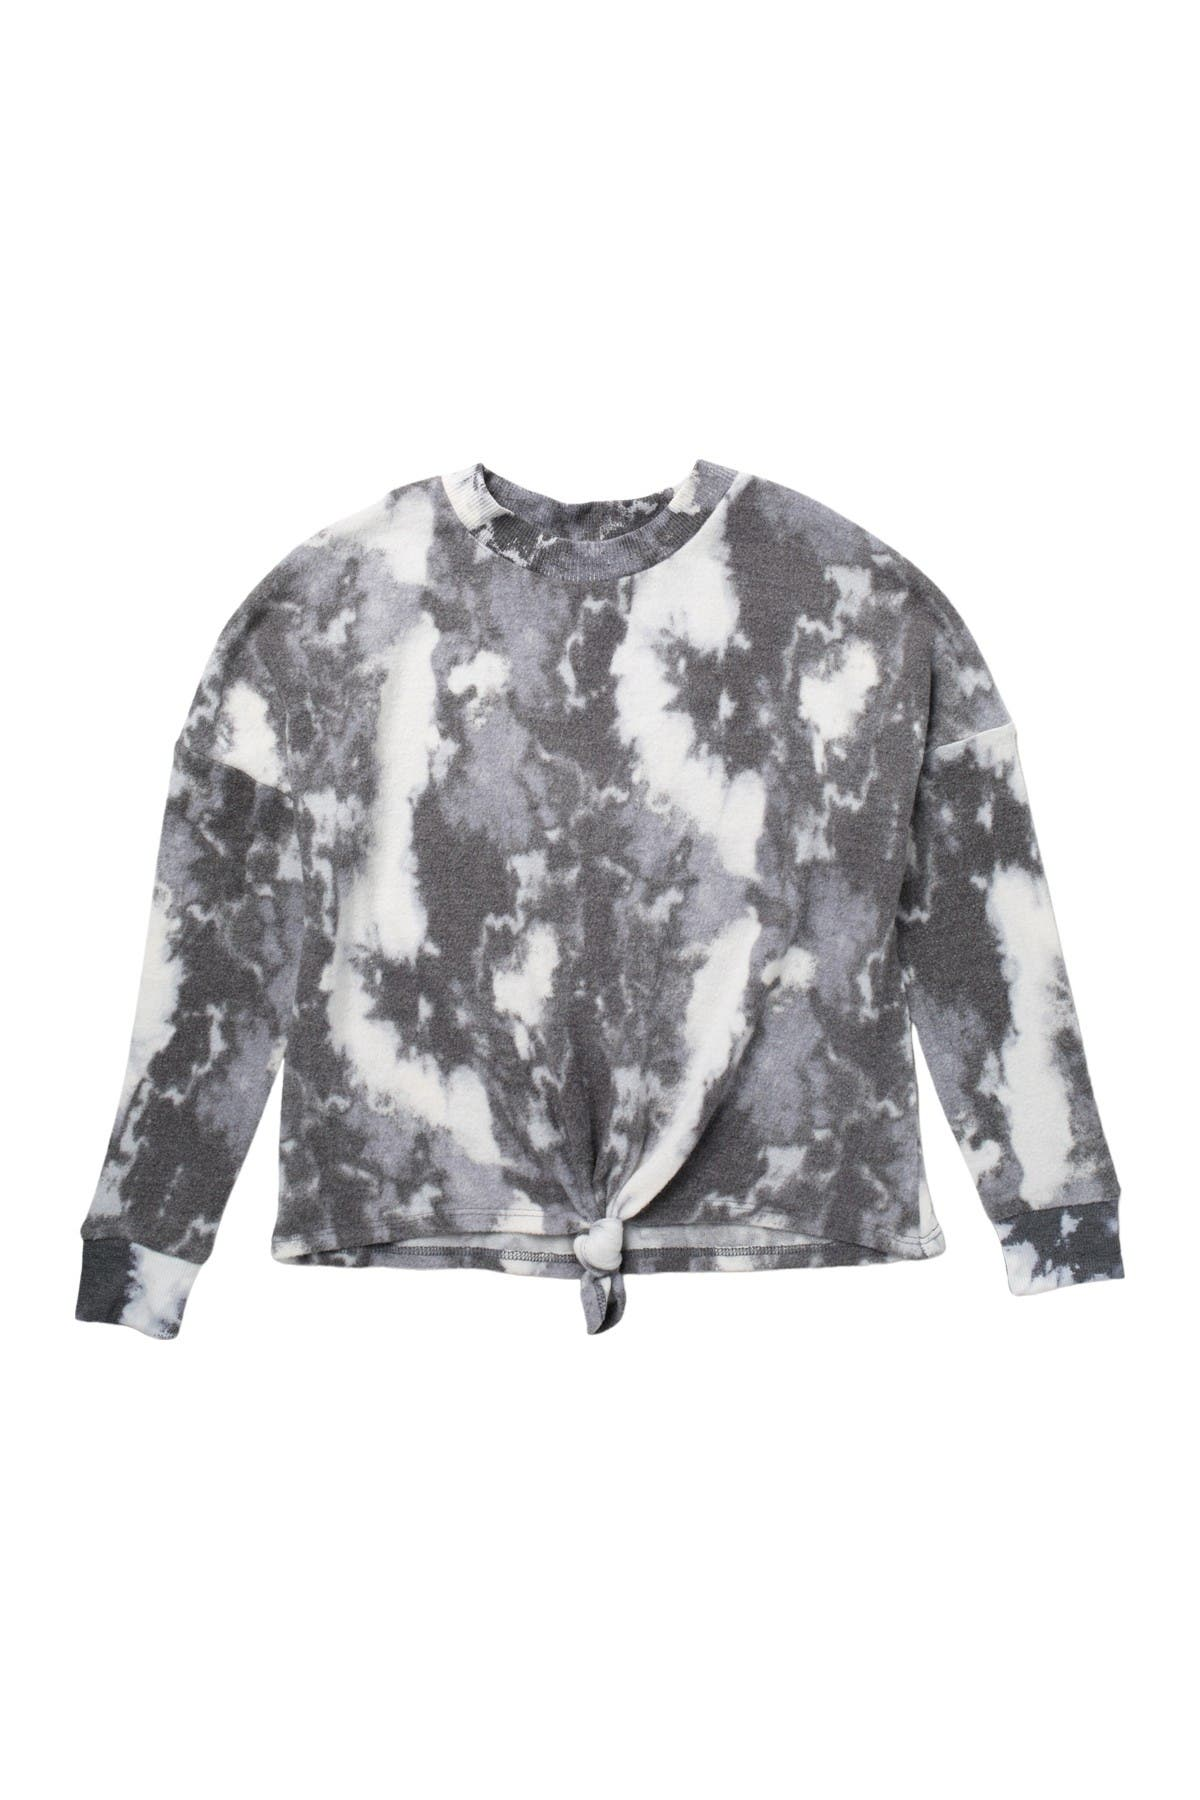 Image of Love, Fire Slouchy Tie Front Sweatshirt